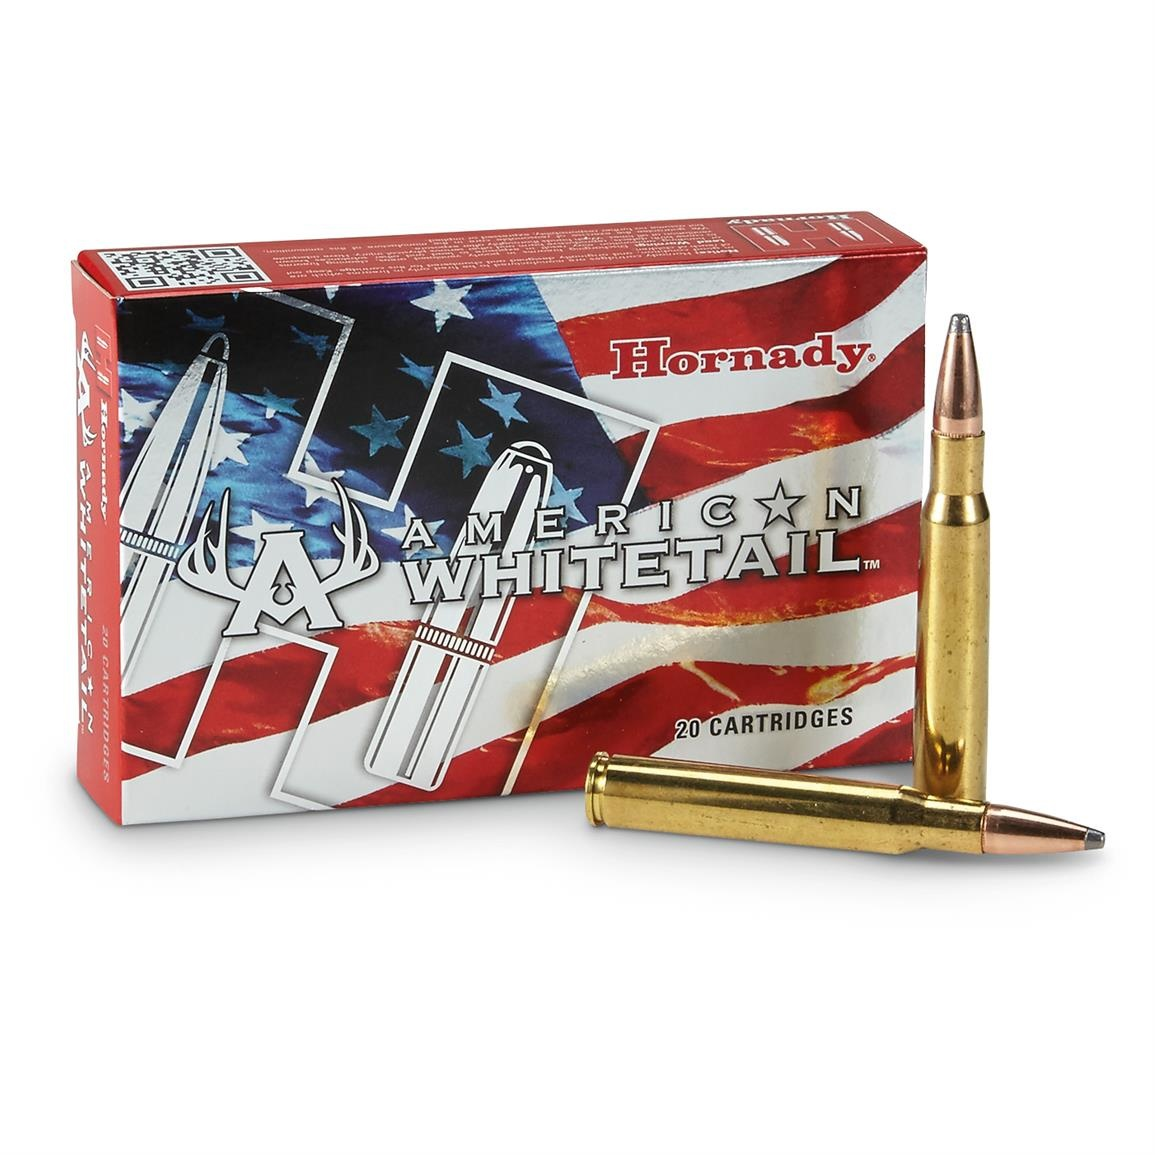 Hornady American Whitetail 7mm Rem Mag, 154 gr Interlock SP (20 Pk)